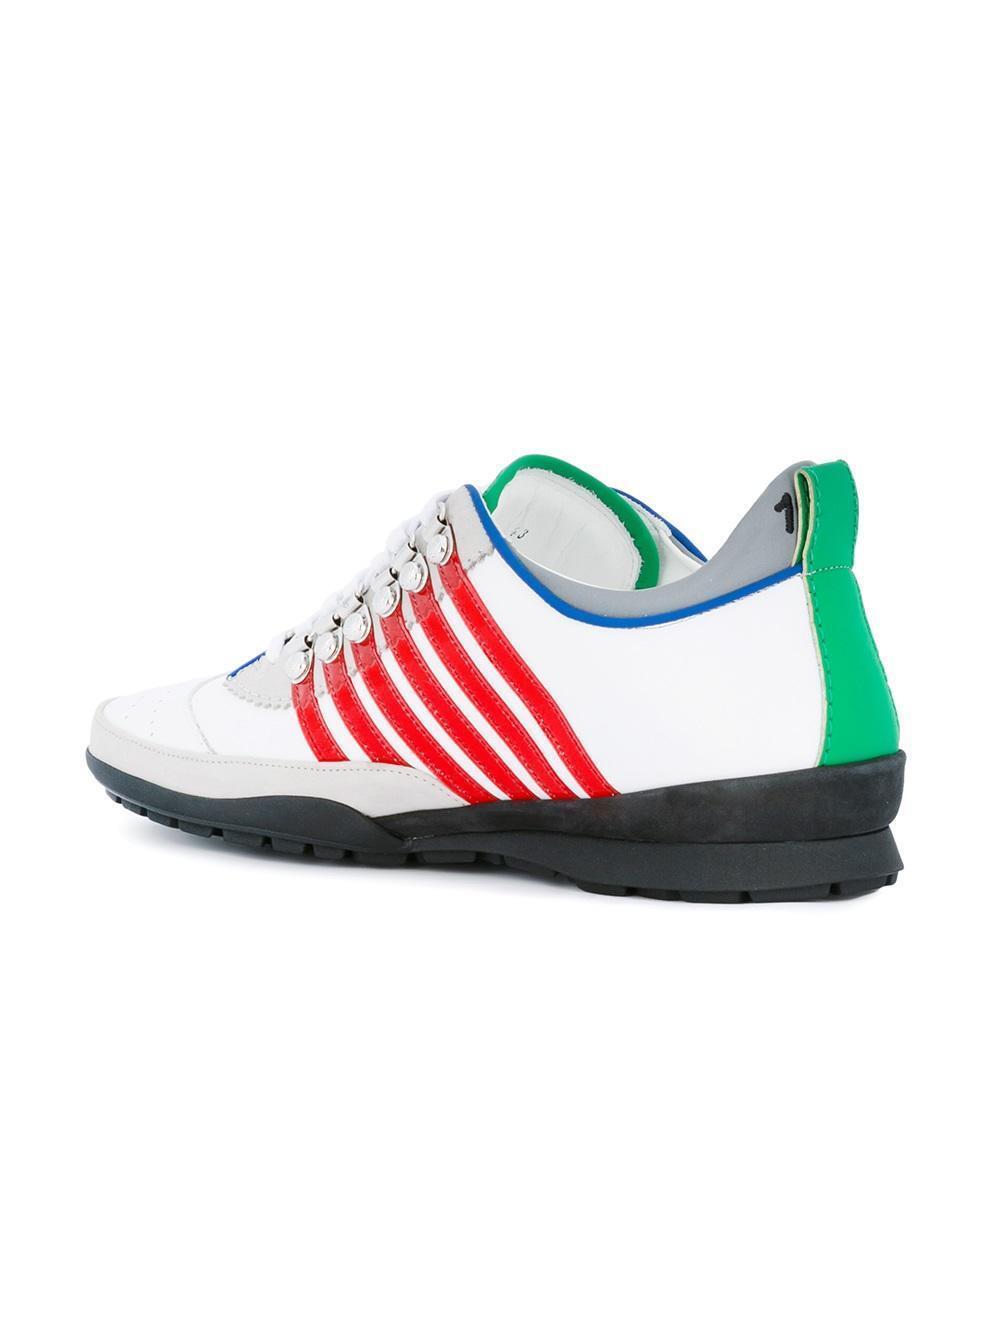 DSQUARED² DSQUARED² DSQUARED² BASKETS 251  'S HOMME Chaussures pour 100%AUT 2662ee